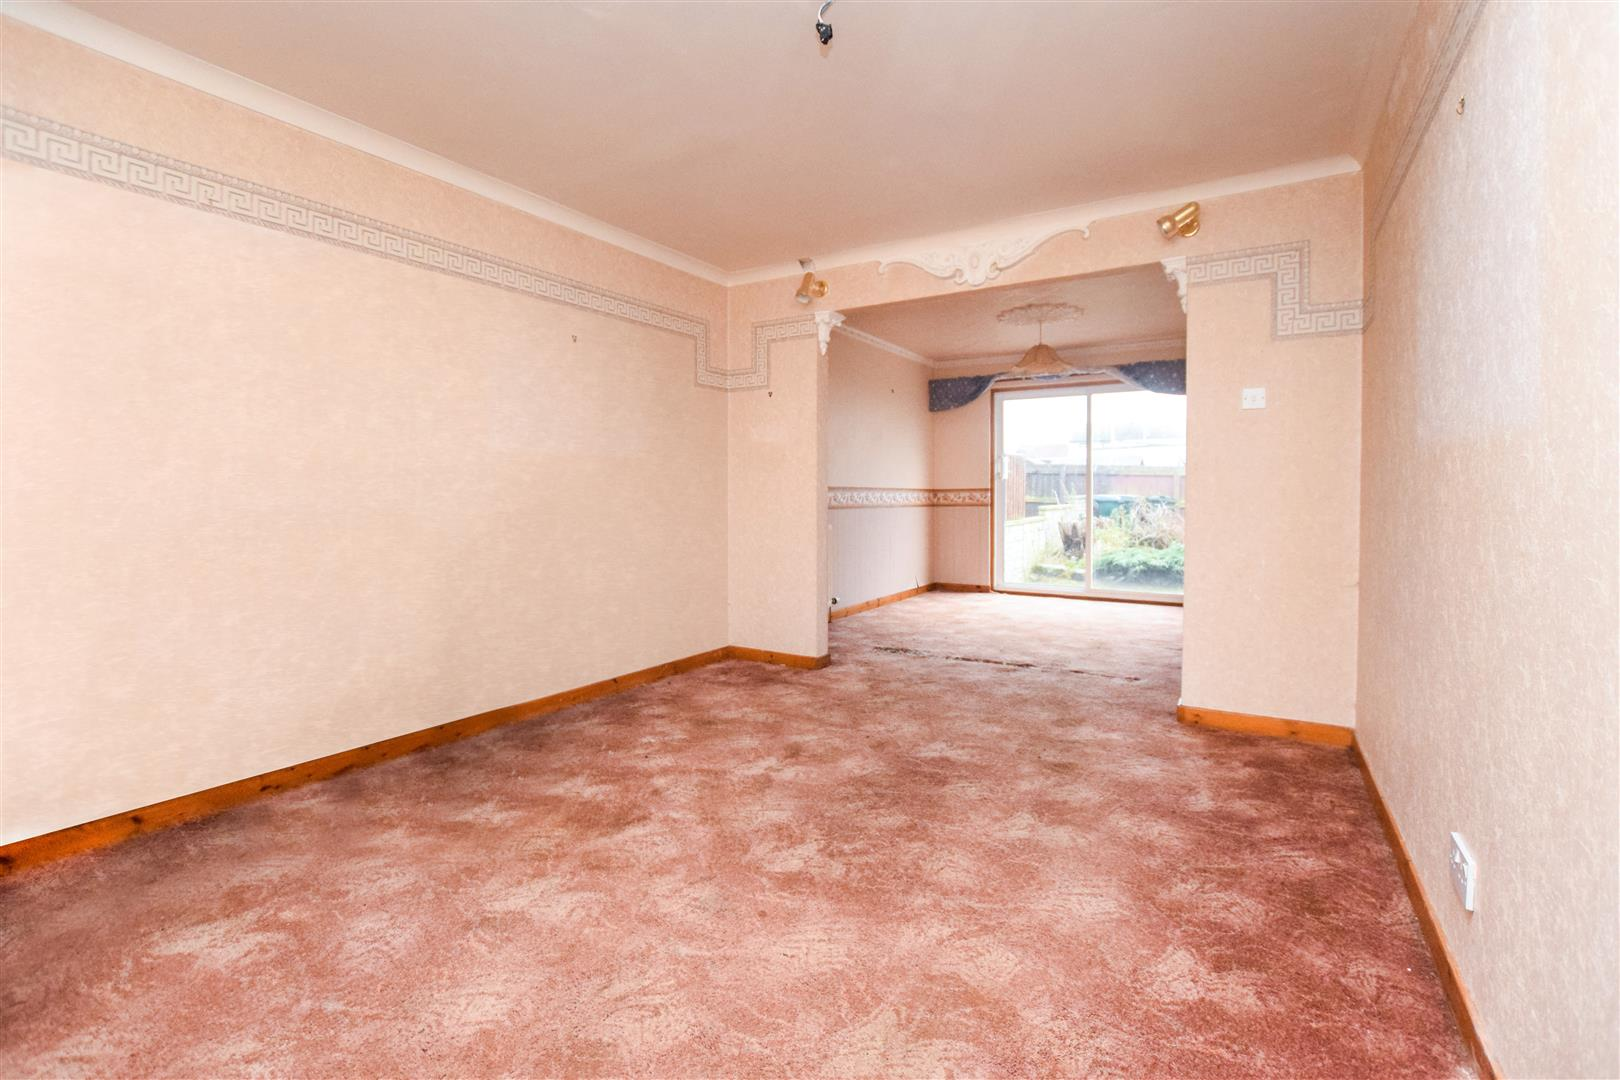 53, Eriskay Place, Perth, Perthshire, PH1 3DH, UK